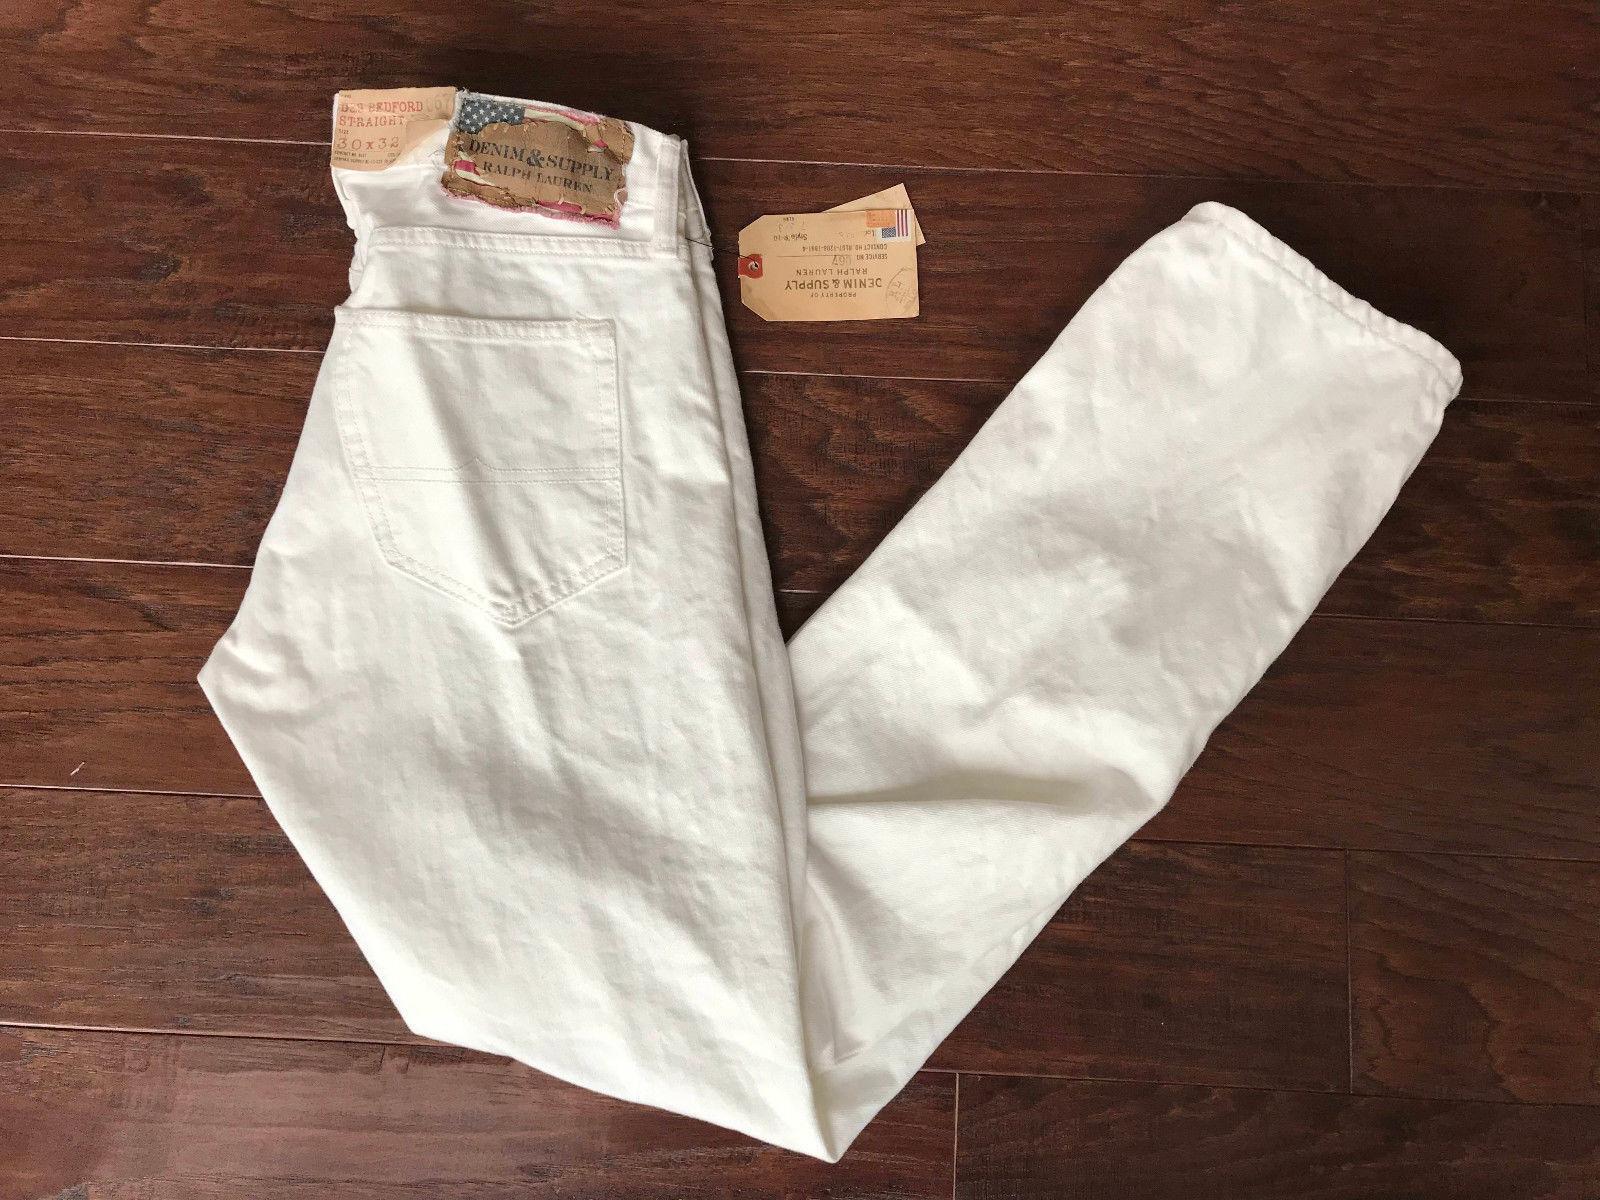 Denim Supply Ralph Lauren Straight-fit Coolige Jeans  White Mens Size 30x32 New